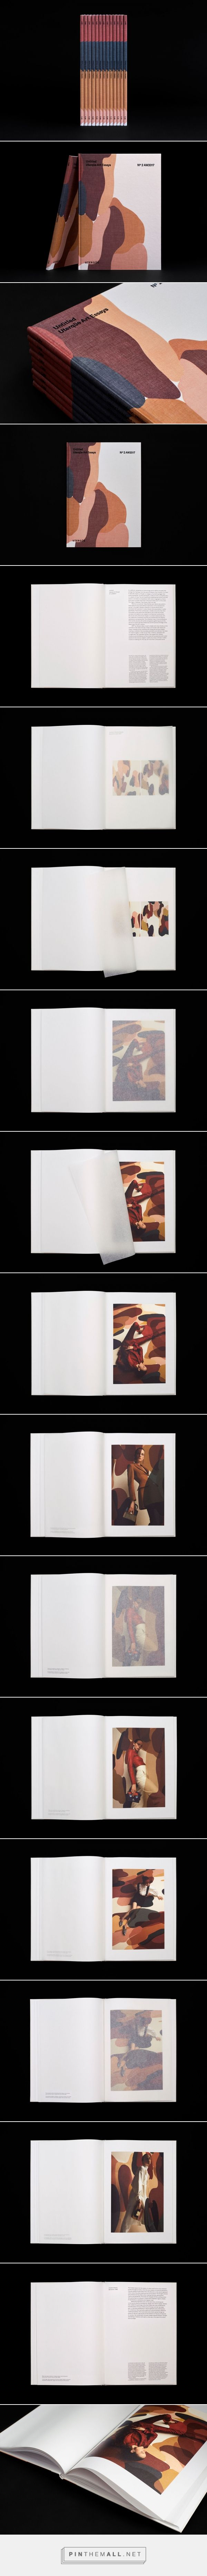 Uterqüe. Press Book AW17 on Behance - created via https://pinthemall.net